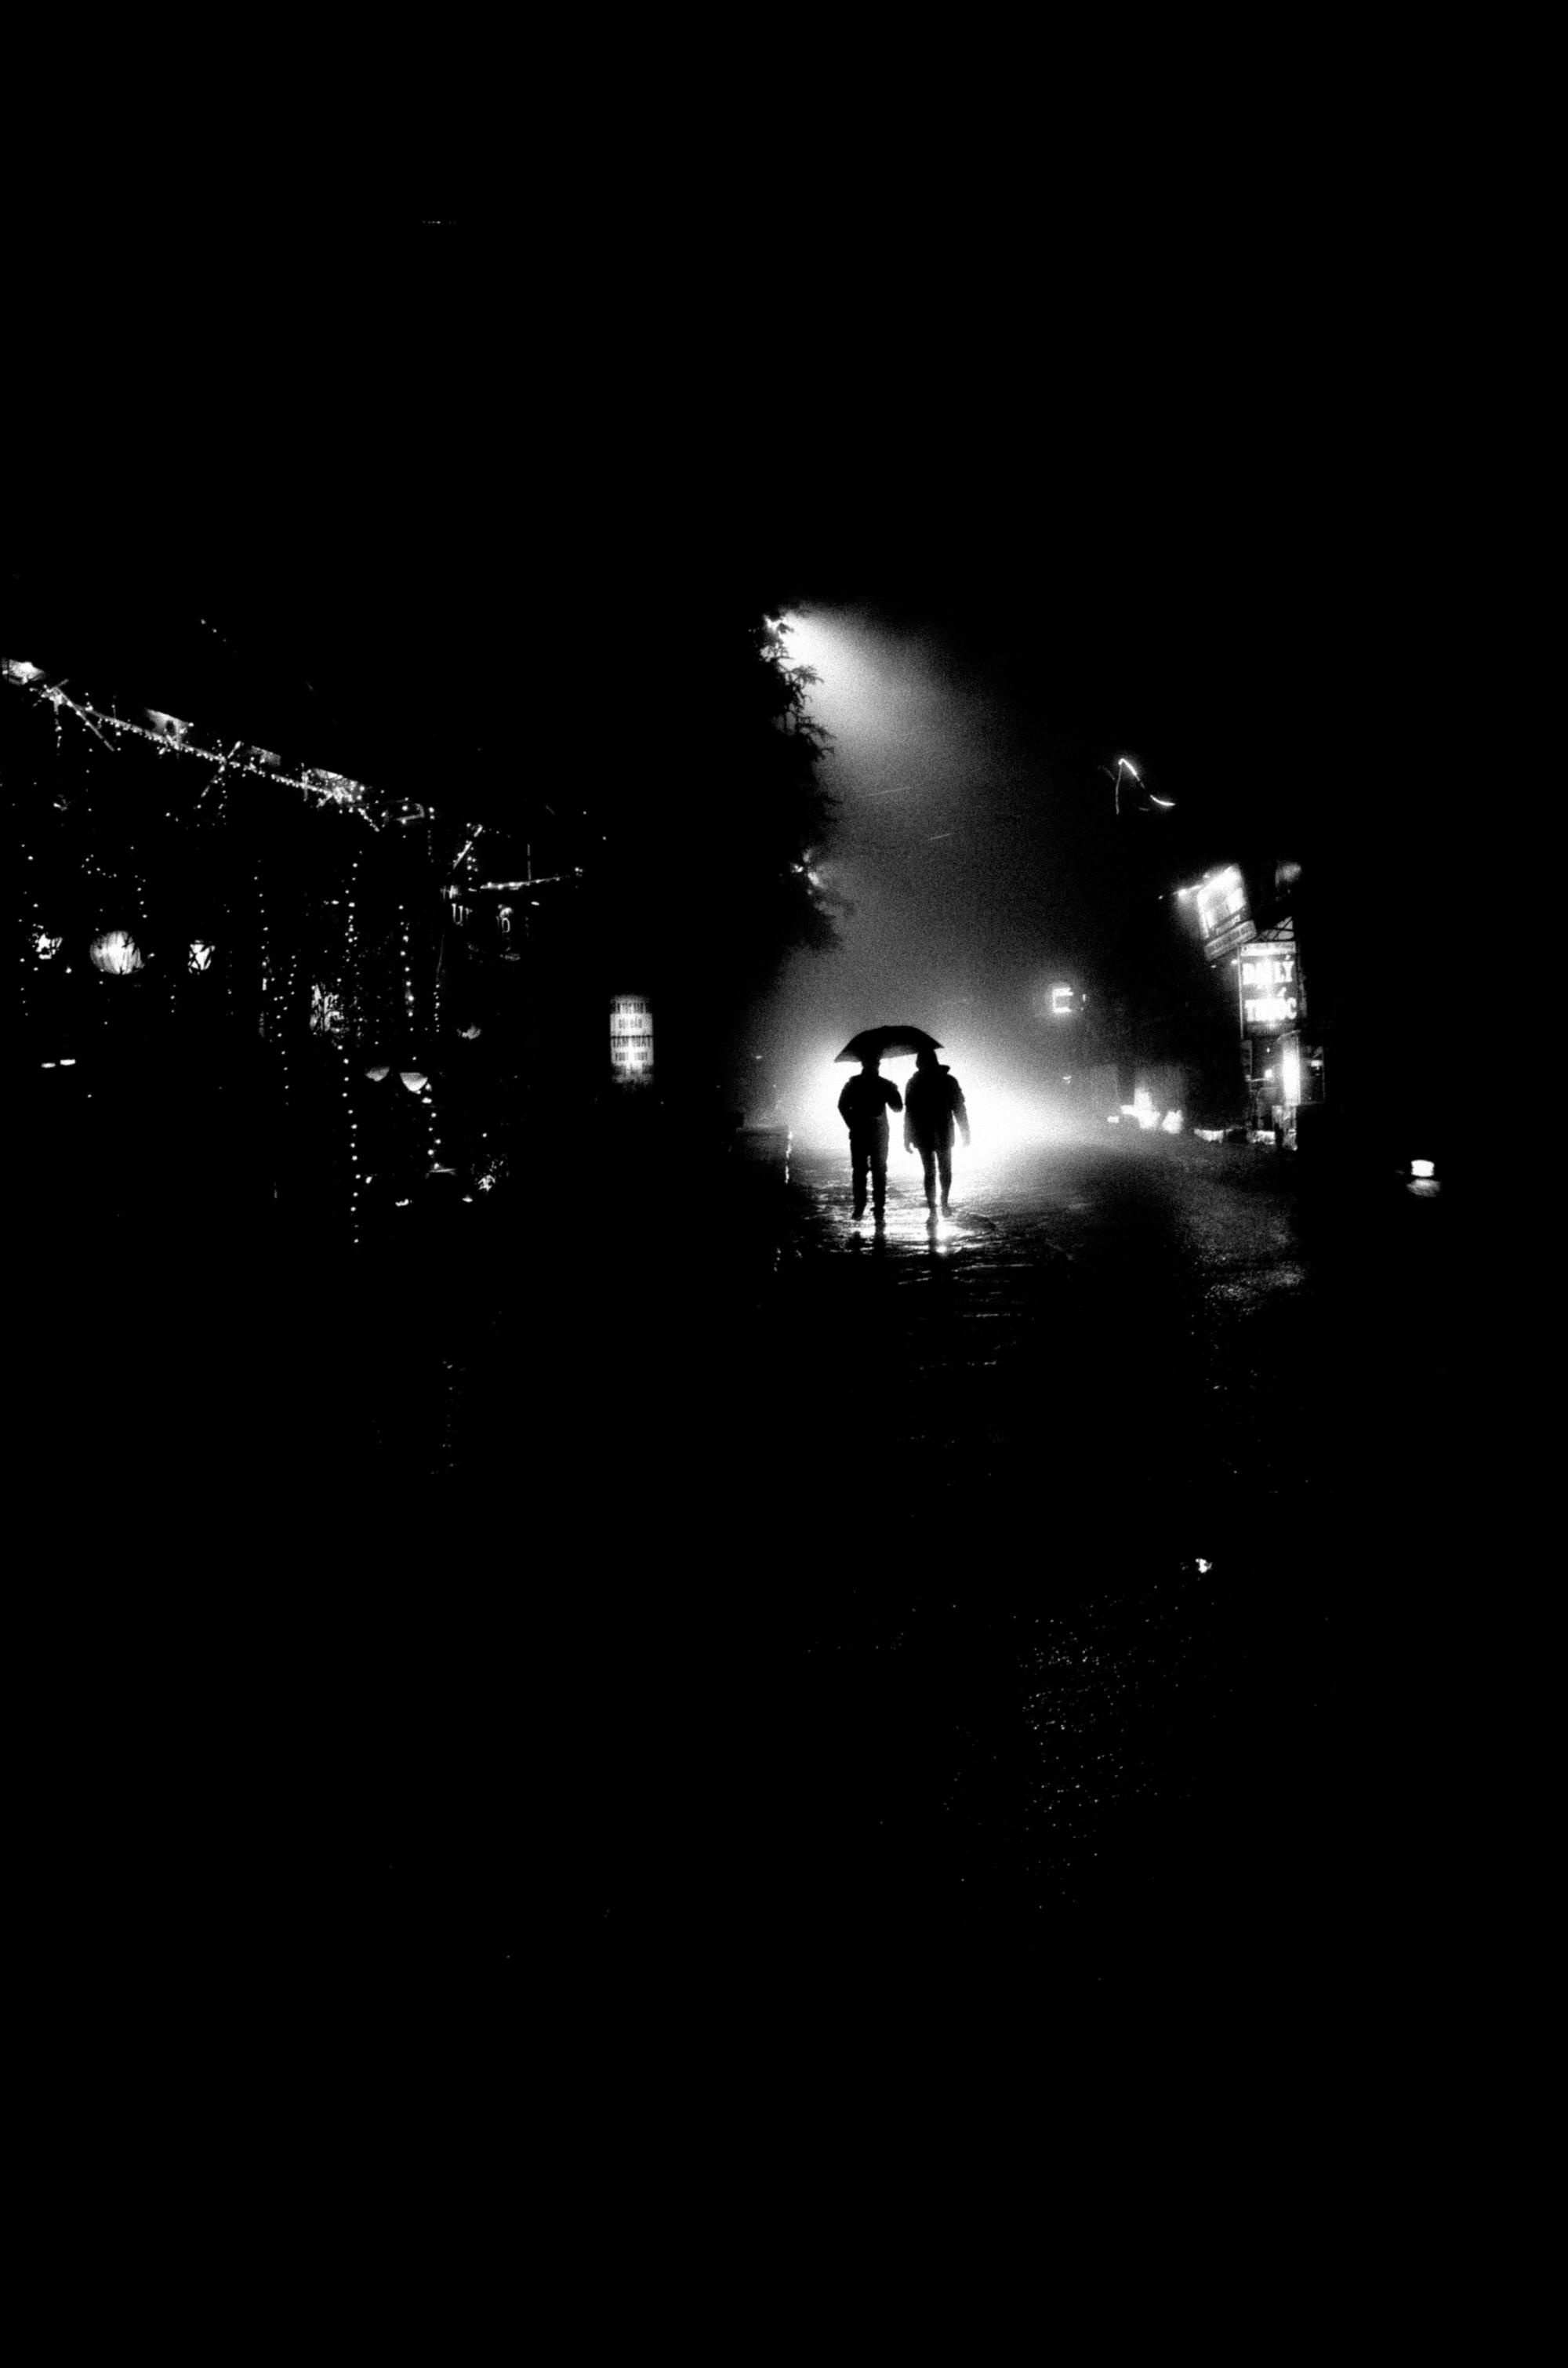 eric kim street photography -sapa-0006078